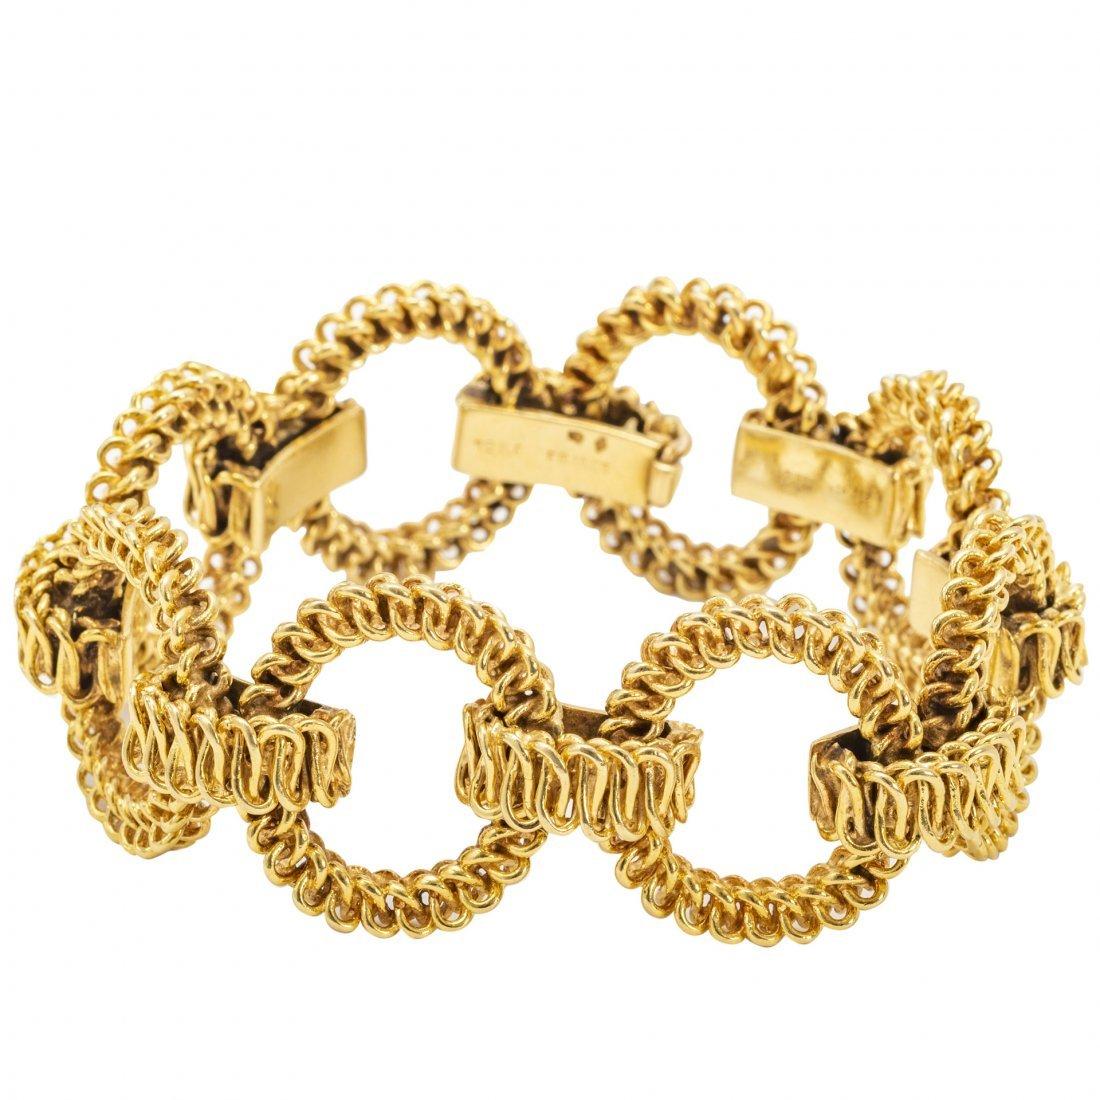 Tiffany & Co., 18kt Yellow Gold Bracelet